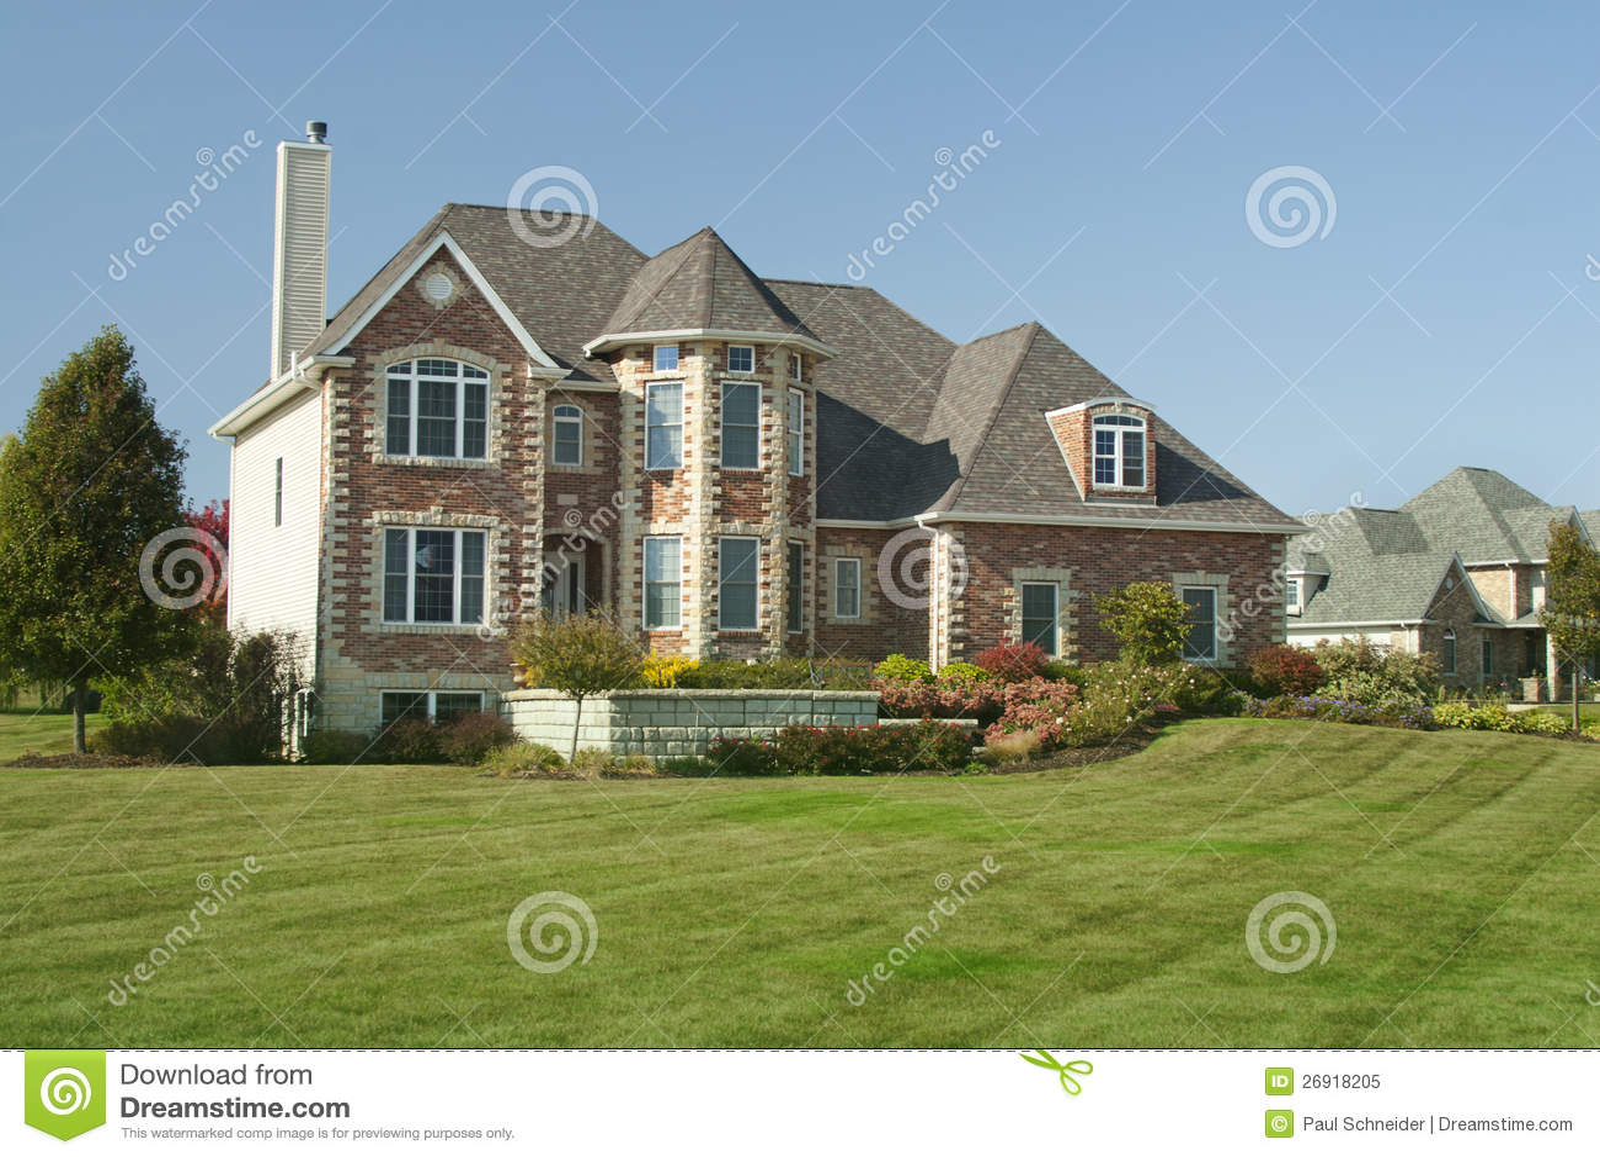 Large House With Three Car Garage Stock Image Image